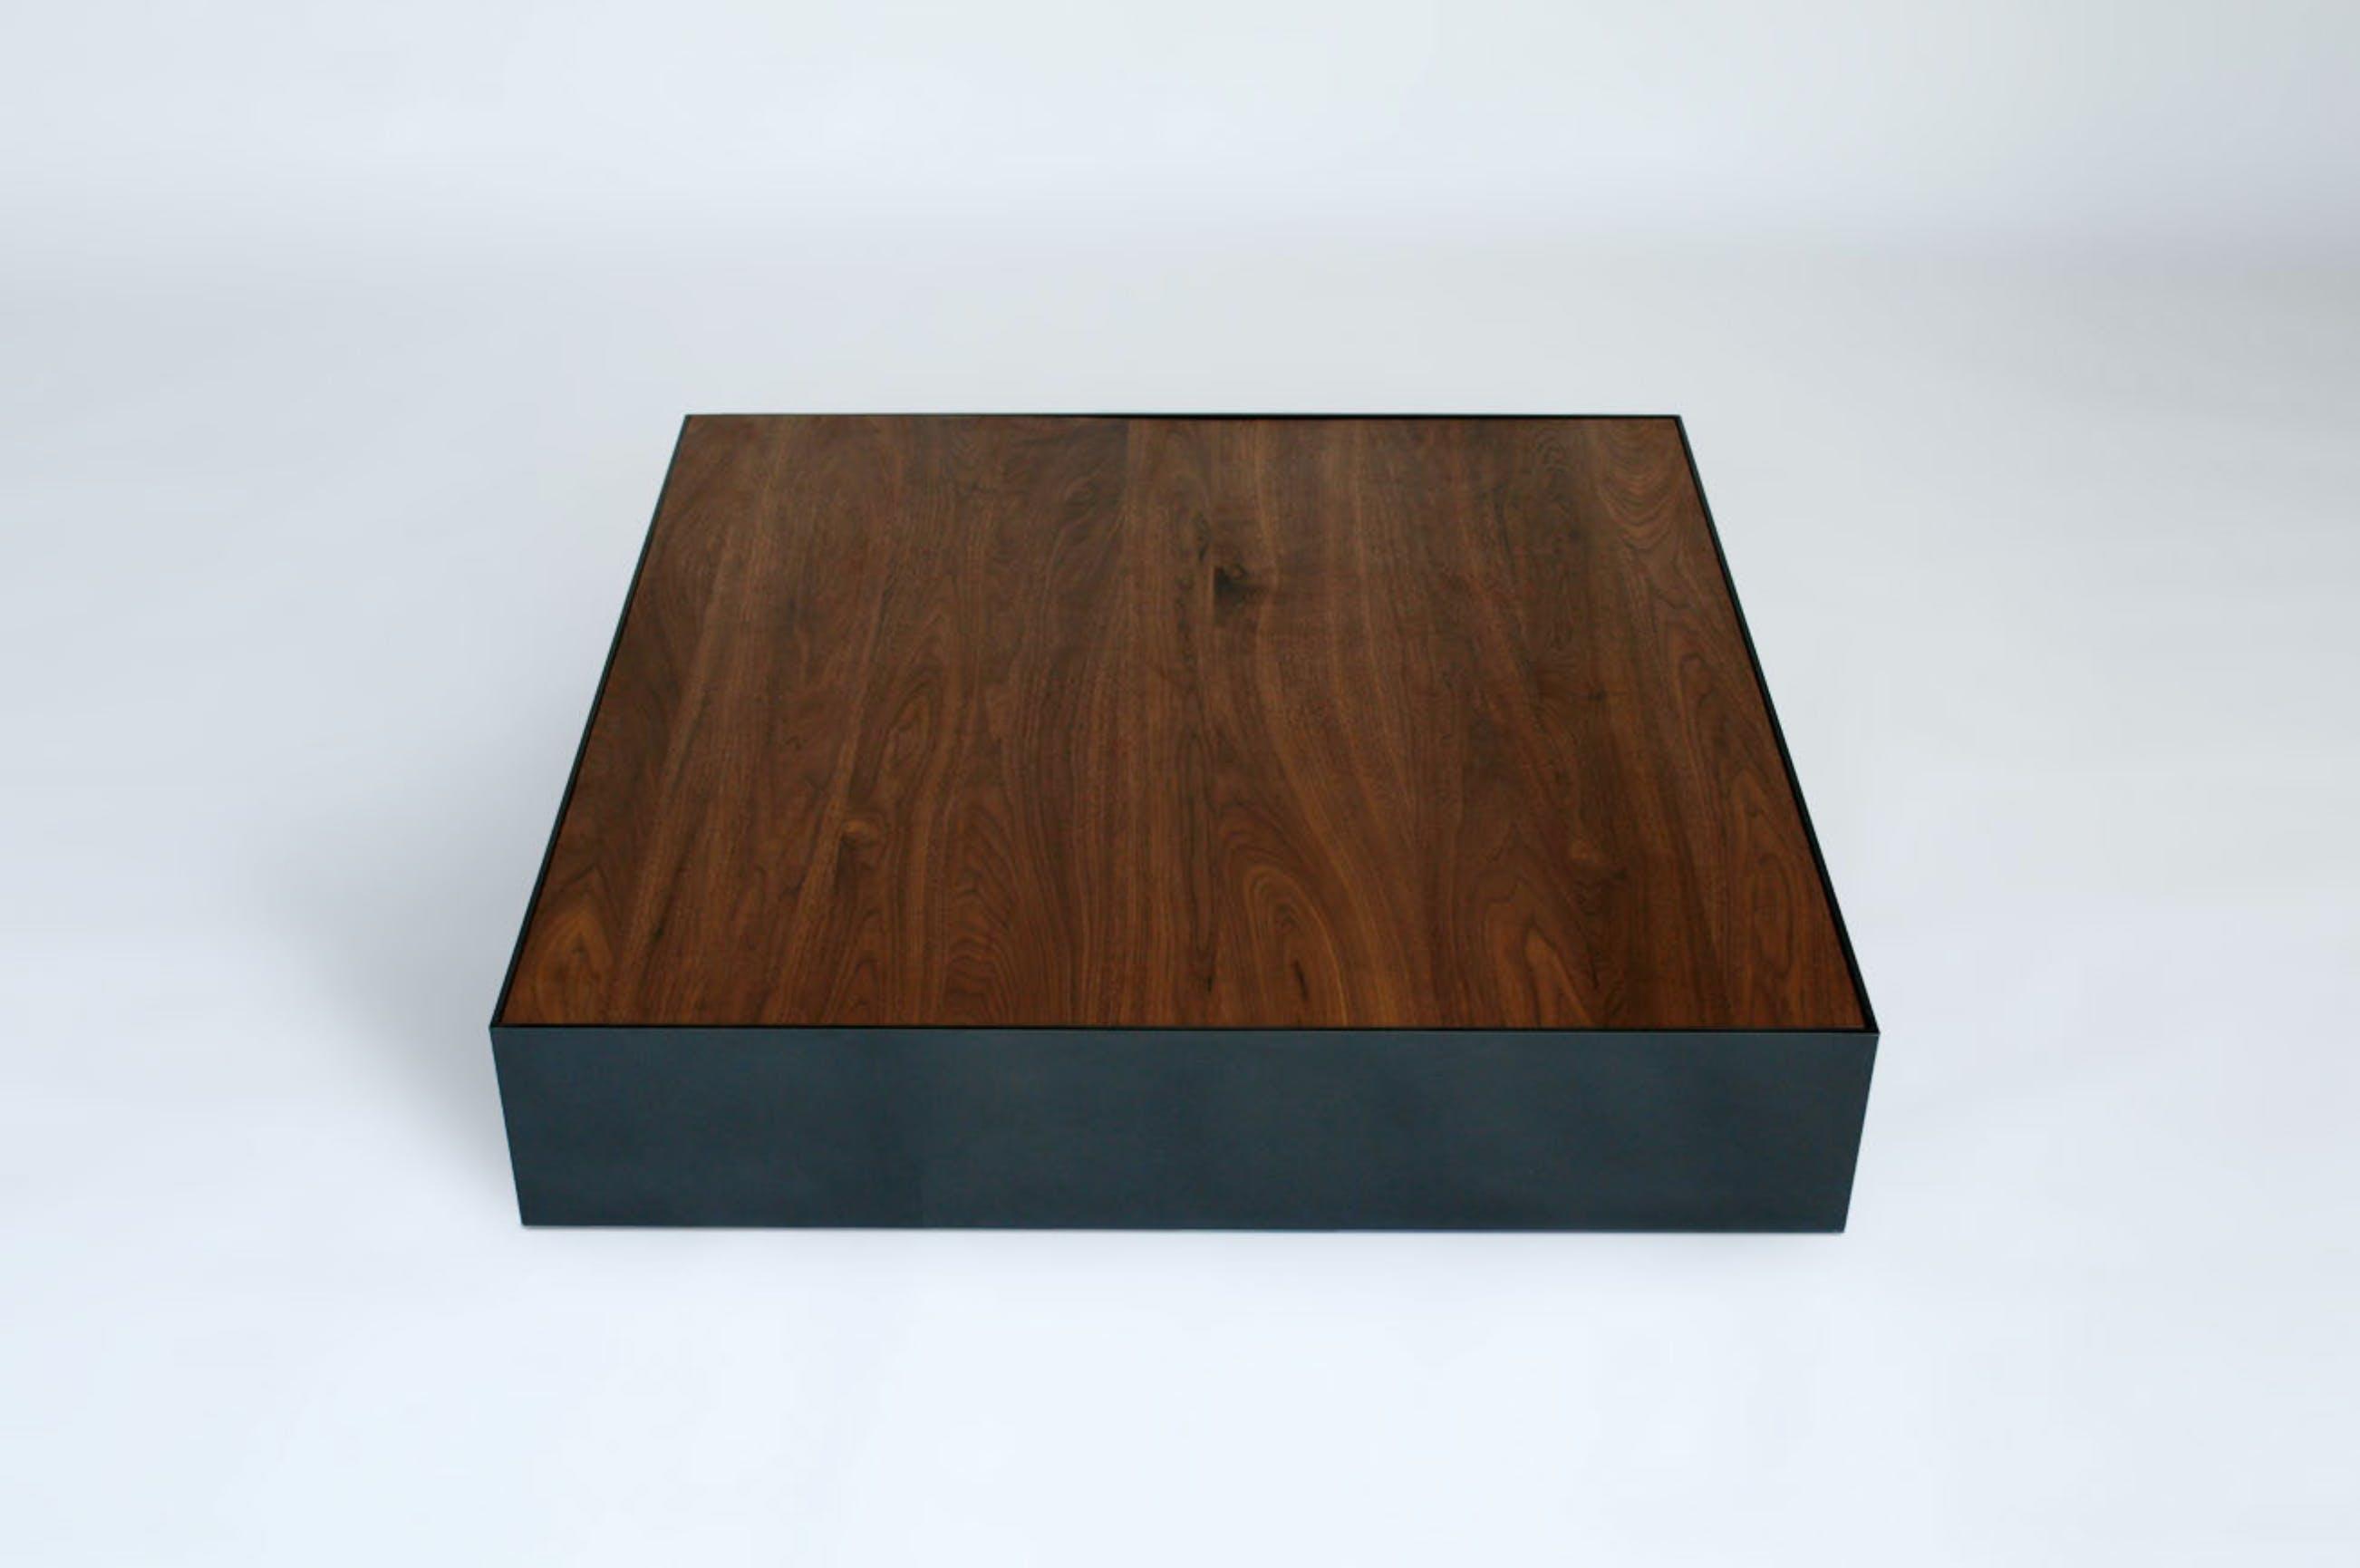 Phase Design Ballot Box Xl Angle Haute Living